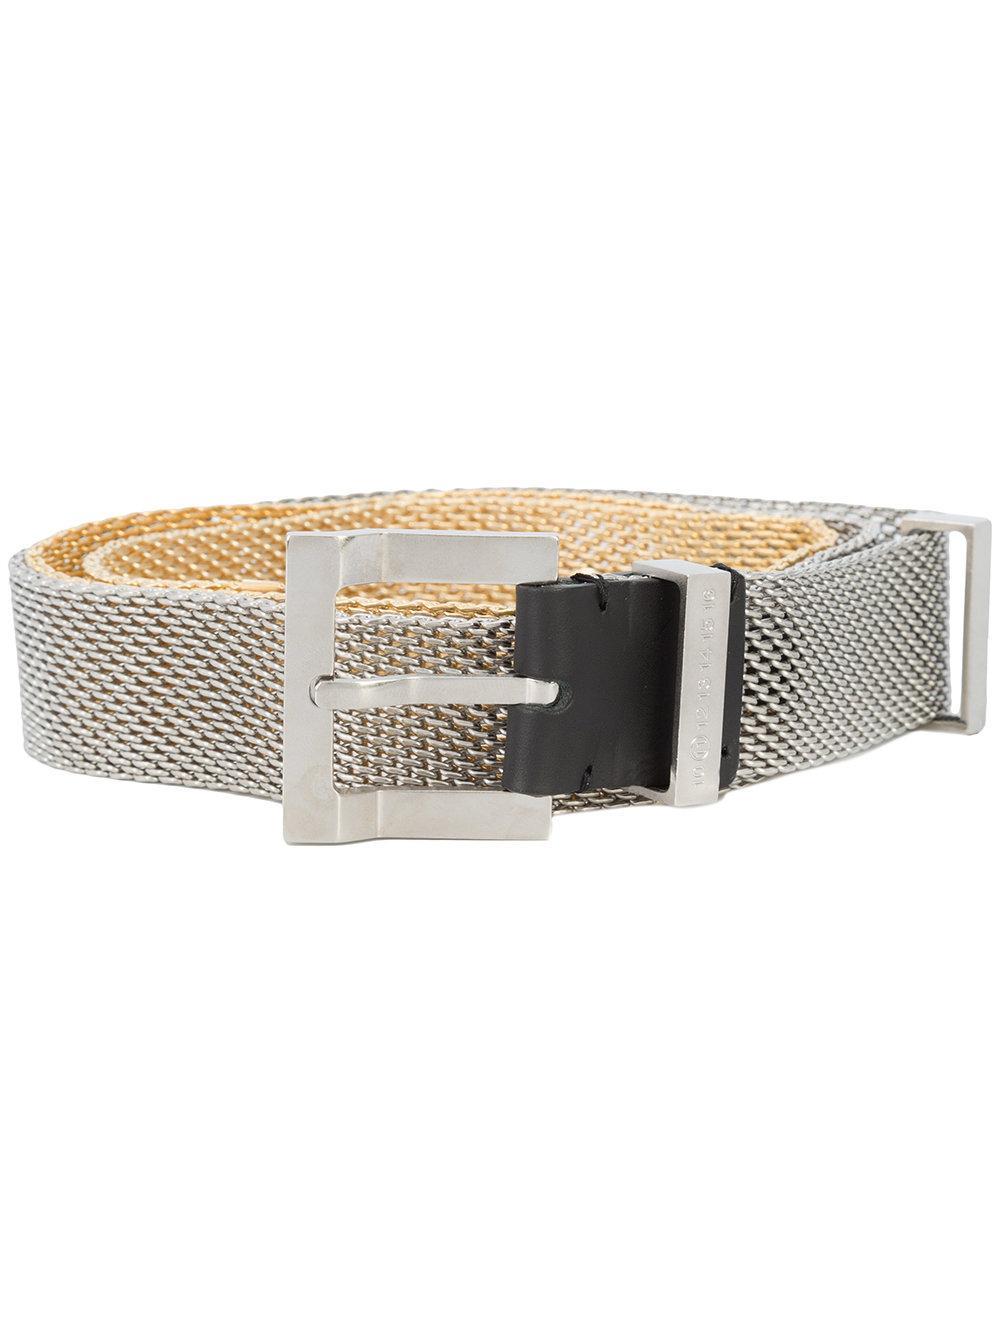 Maison Margiela Mesh Buckled Belt - Grey